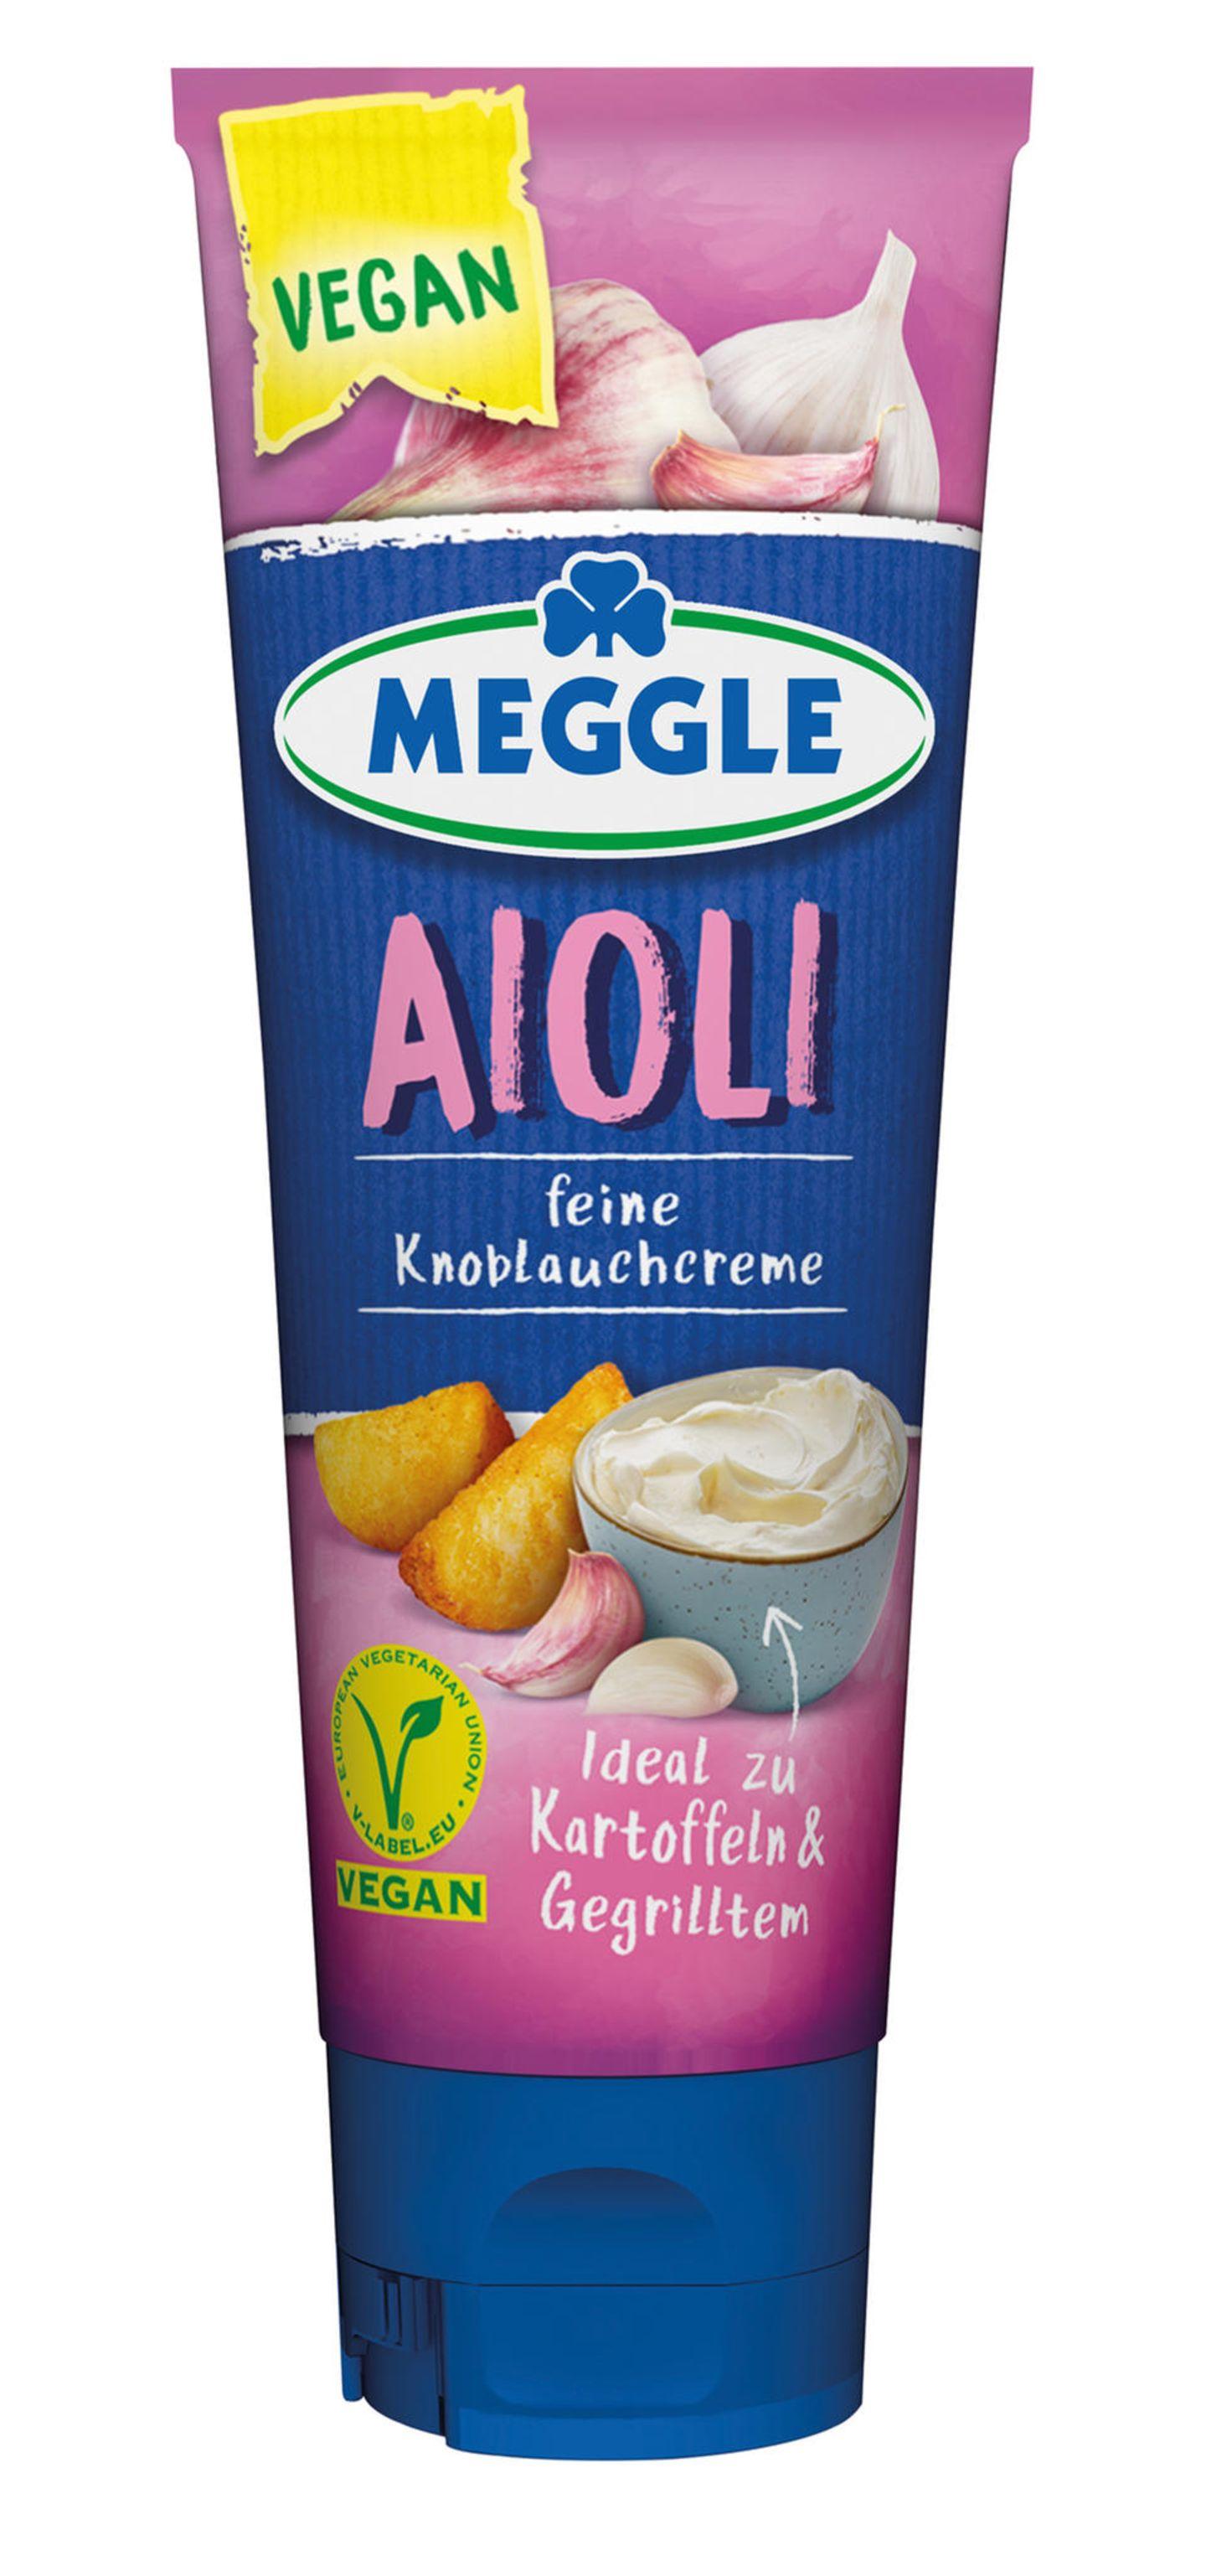 Food News: Meggle Vegane Aioli